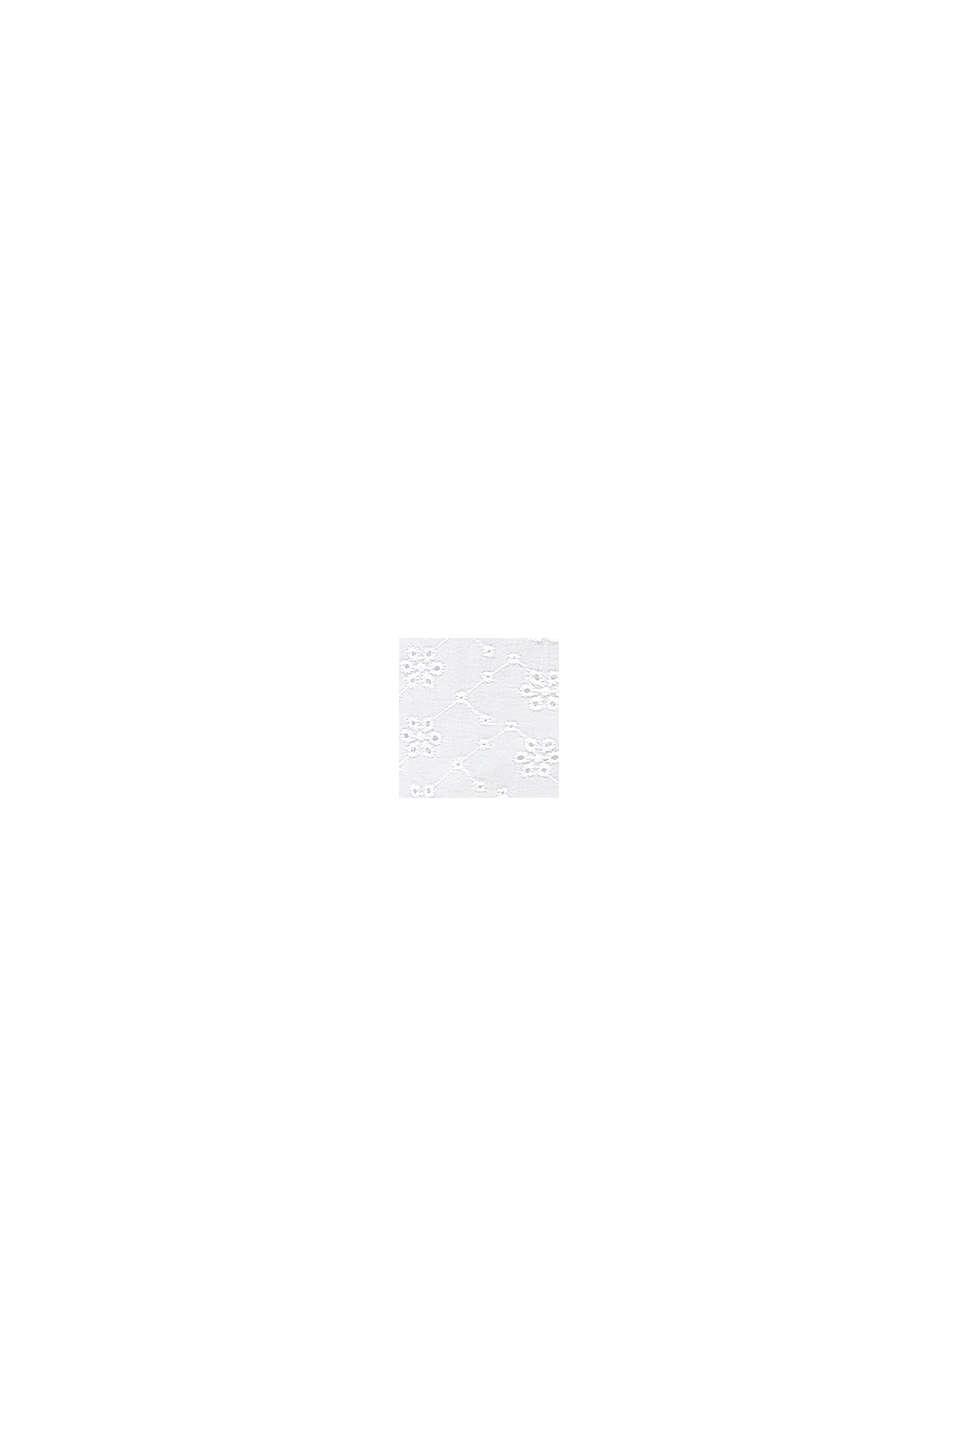 Jurk met opengewerkte kant, 100% katoen, WHITE, swatch